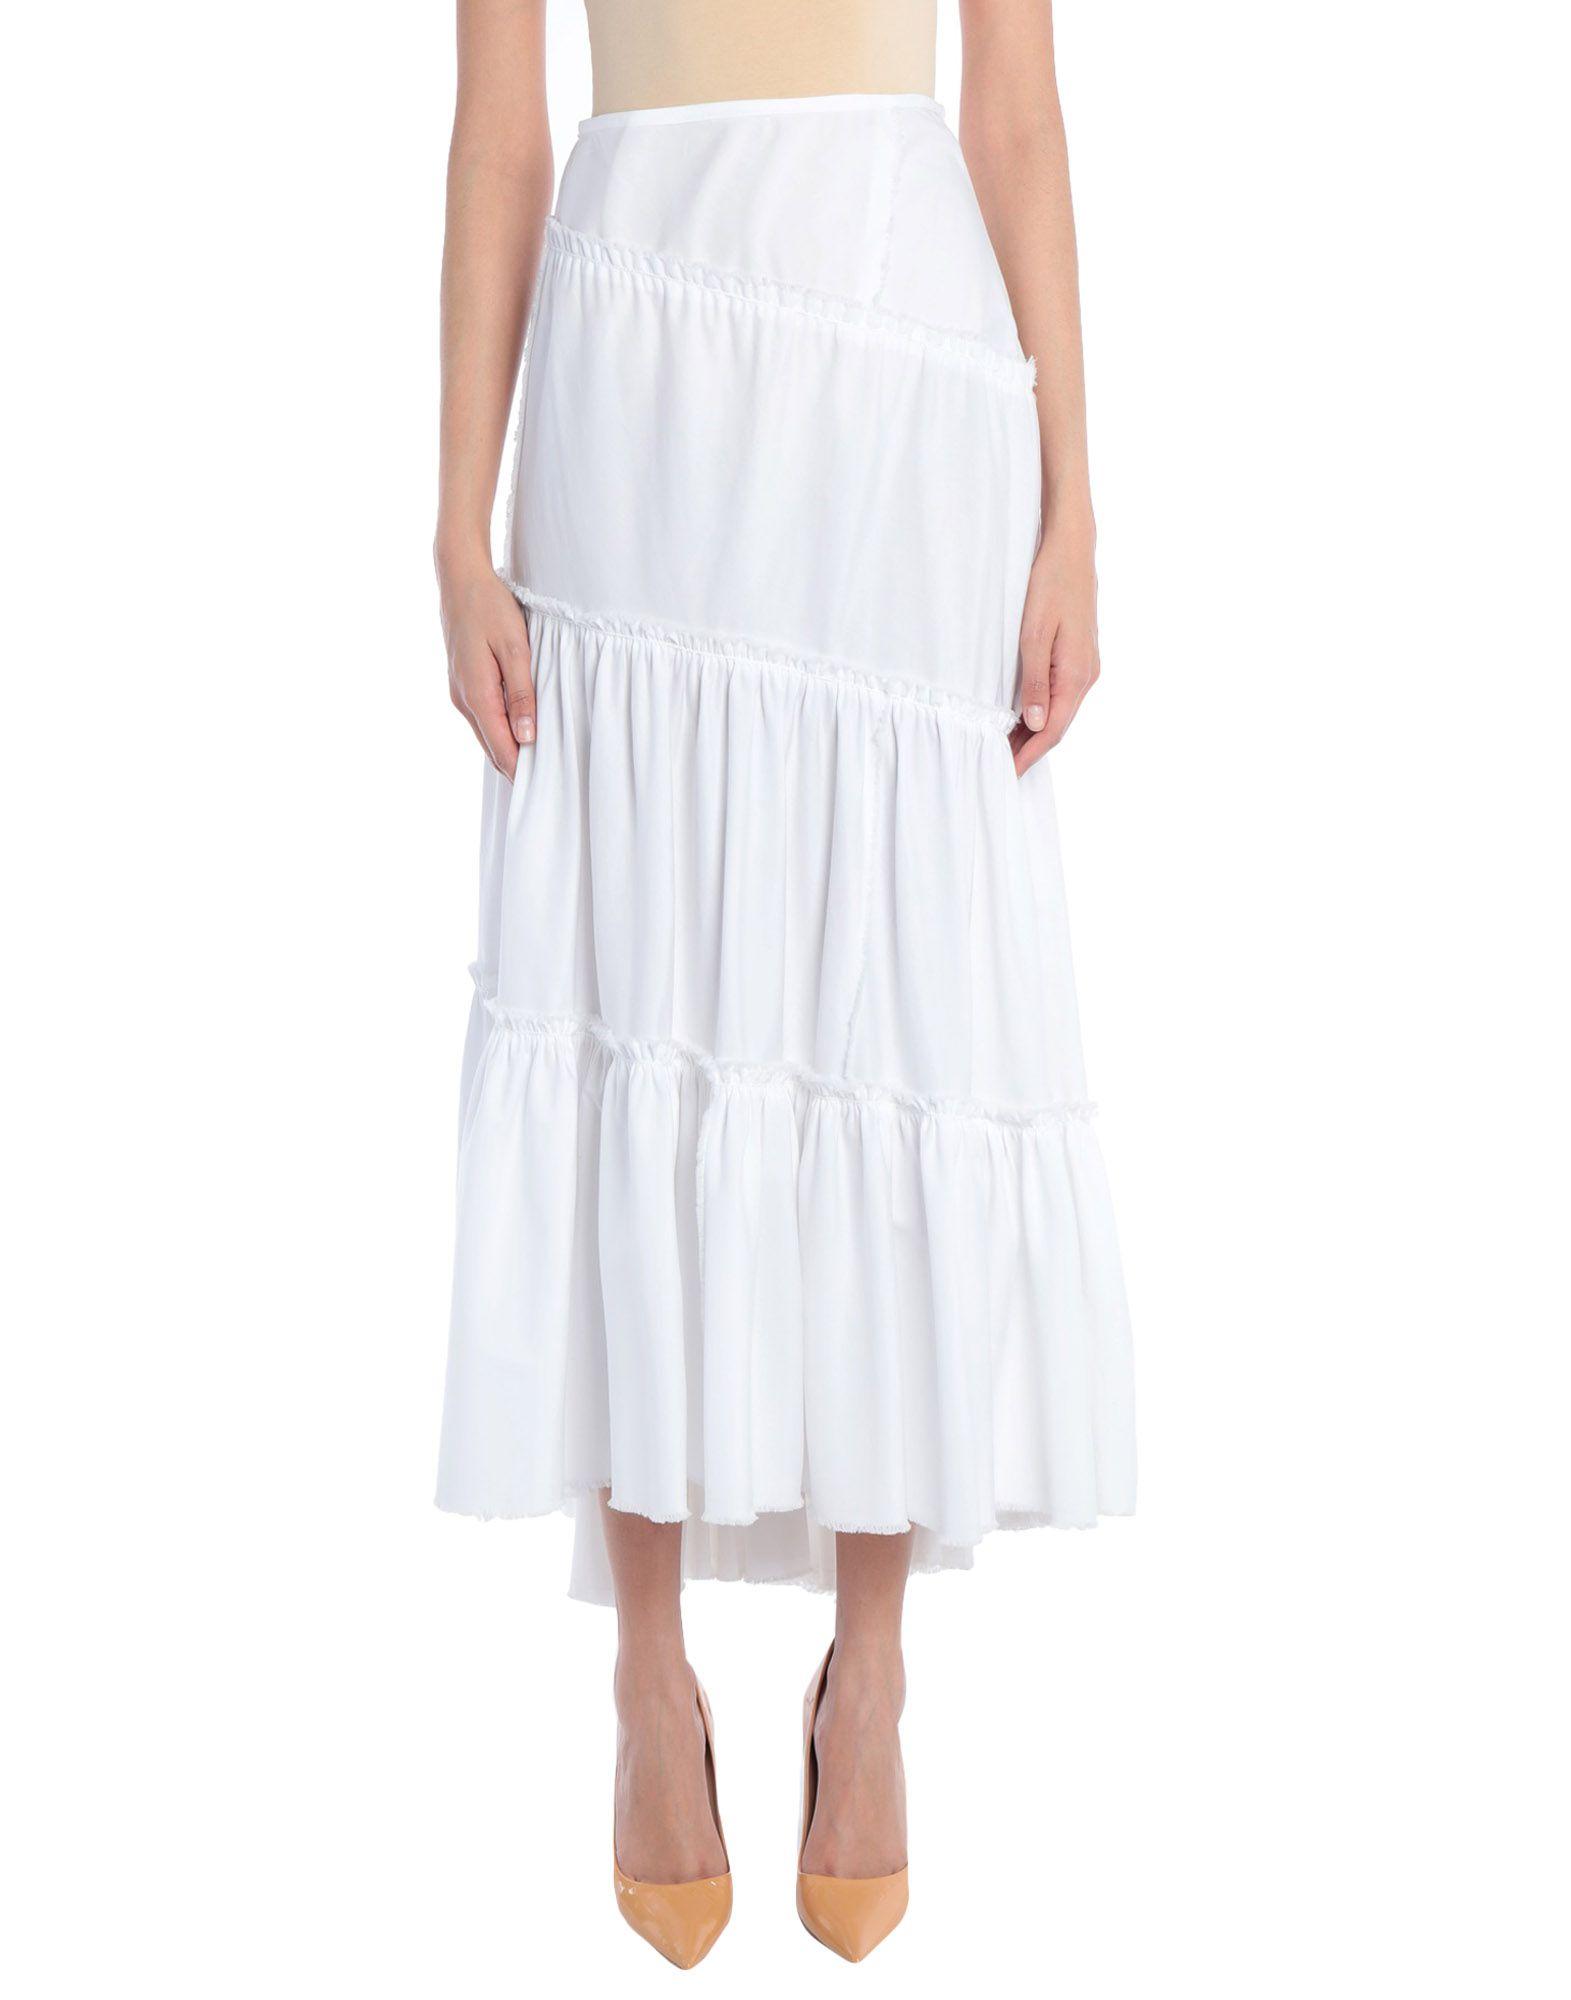 JEAN PAUL GAULTIER FEMME Длинная юбка цены онлайн